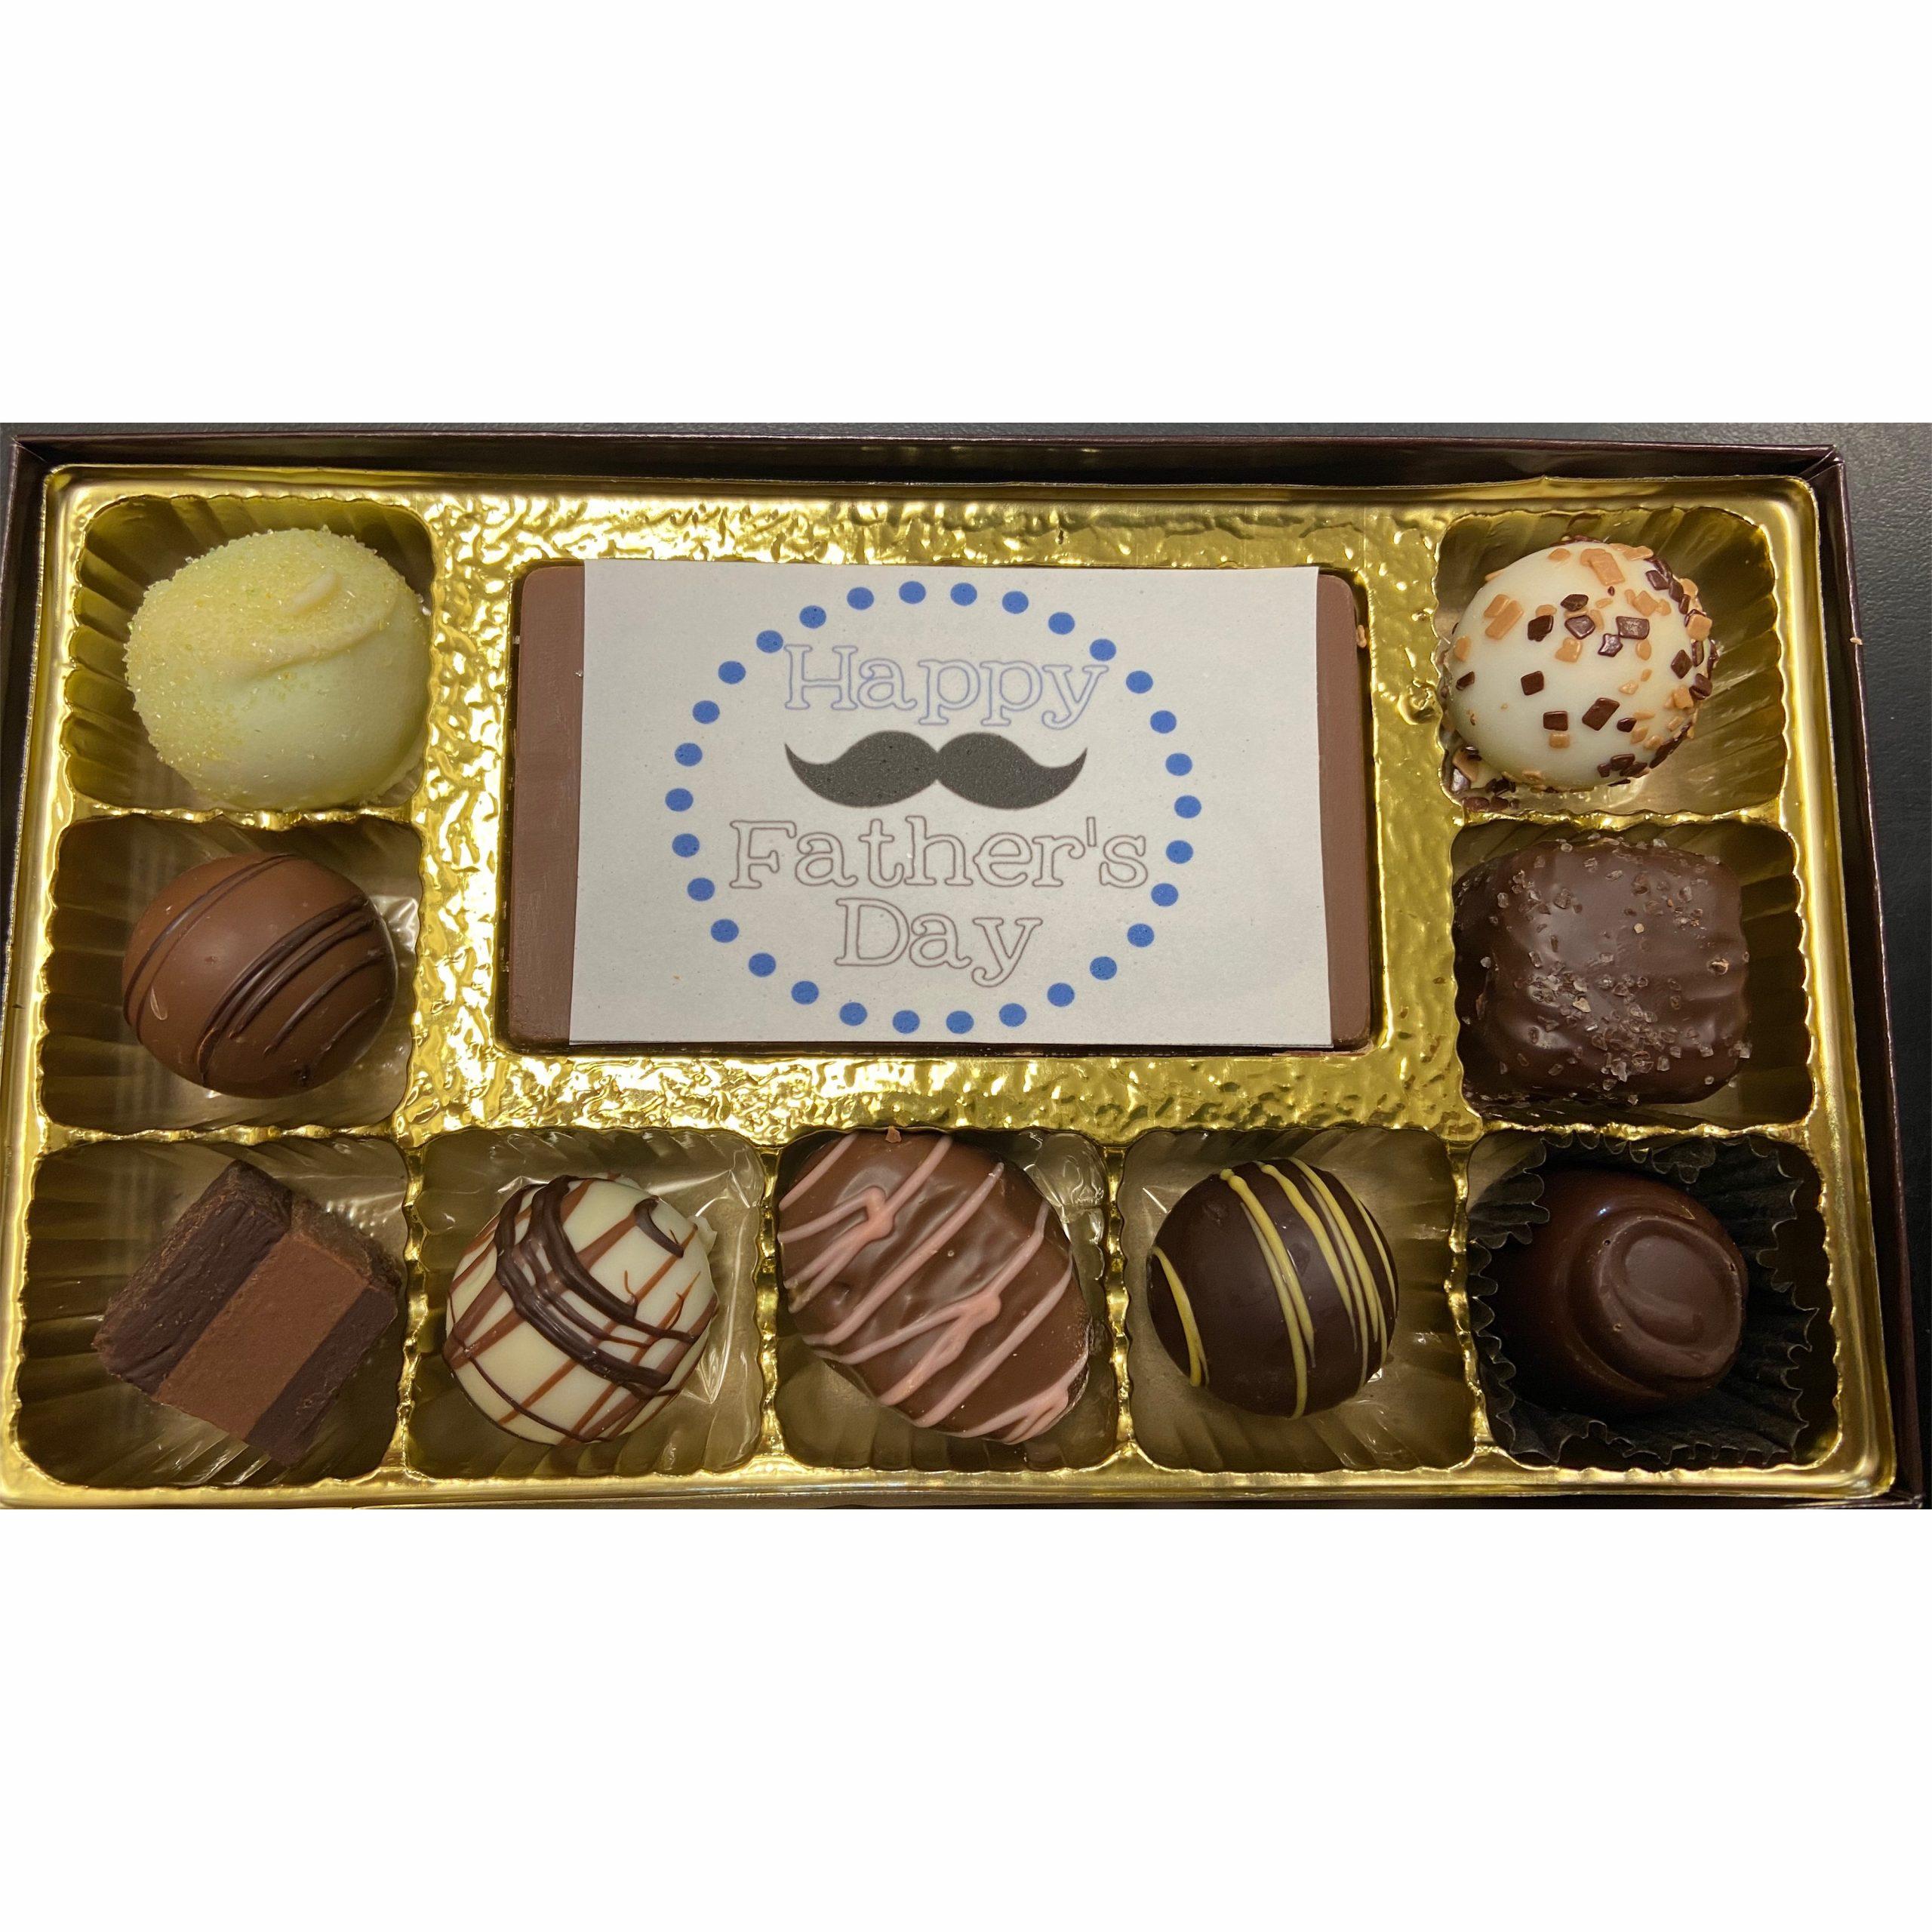 Orlando Maitland Holiday Handmade Chocolate Gifts Baskets Truffles